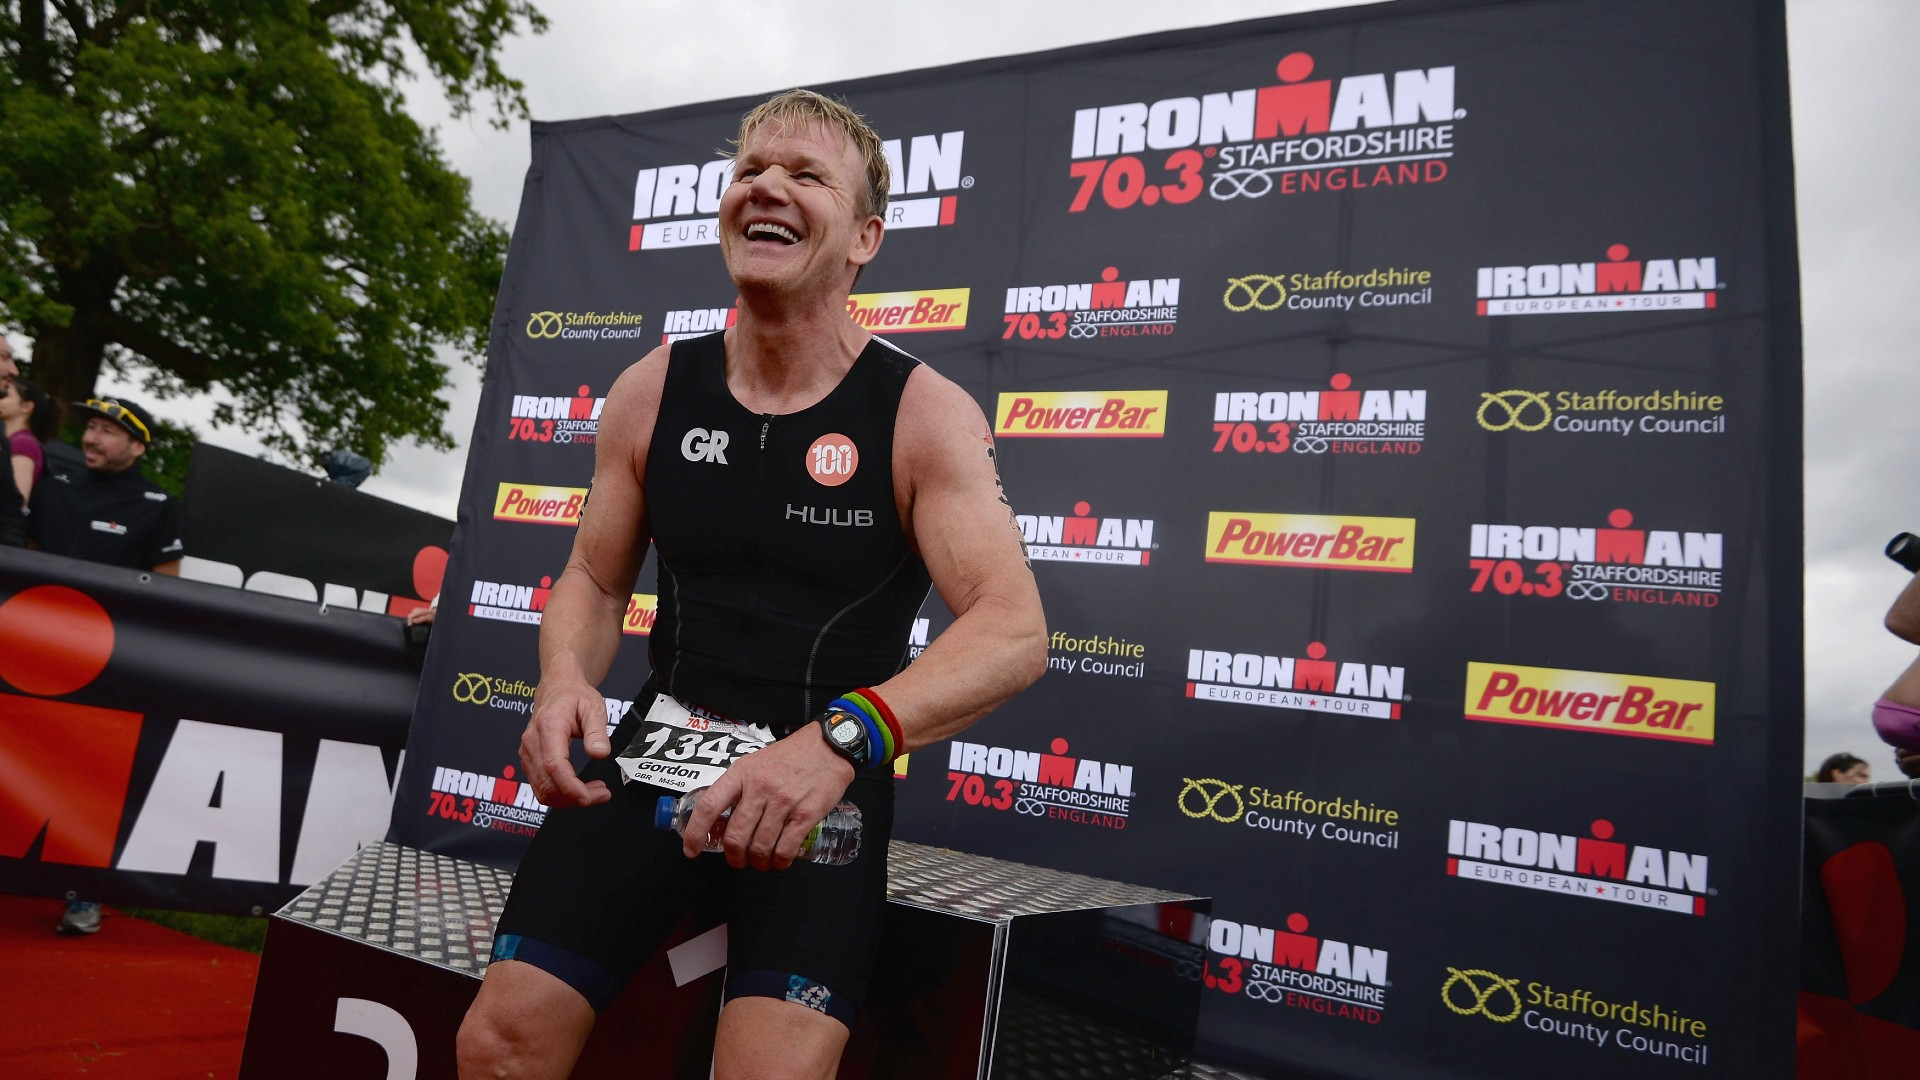 Gordon Ramsay Ironman